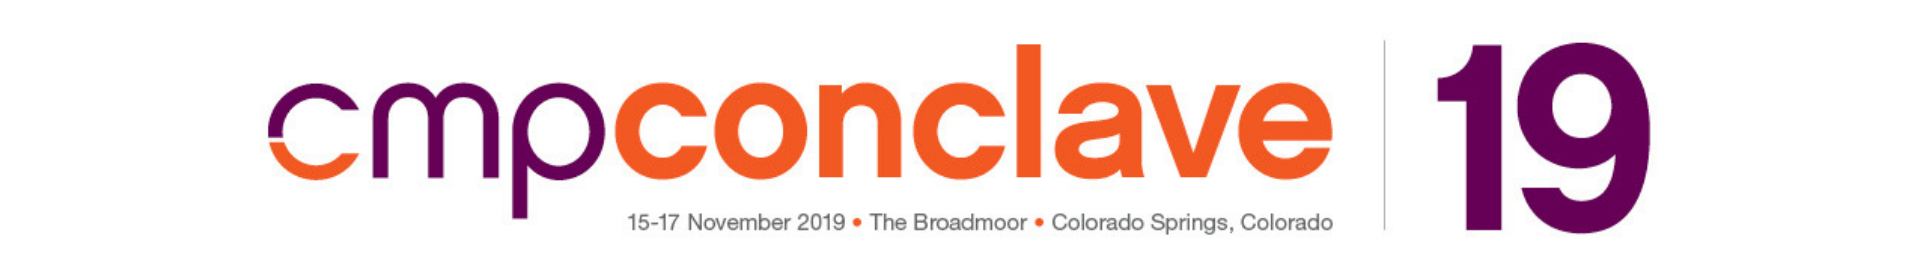 2019 CMP Conclave Event Banner